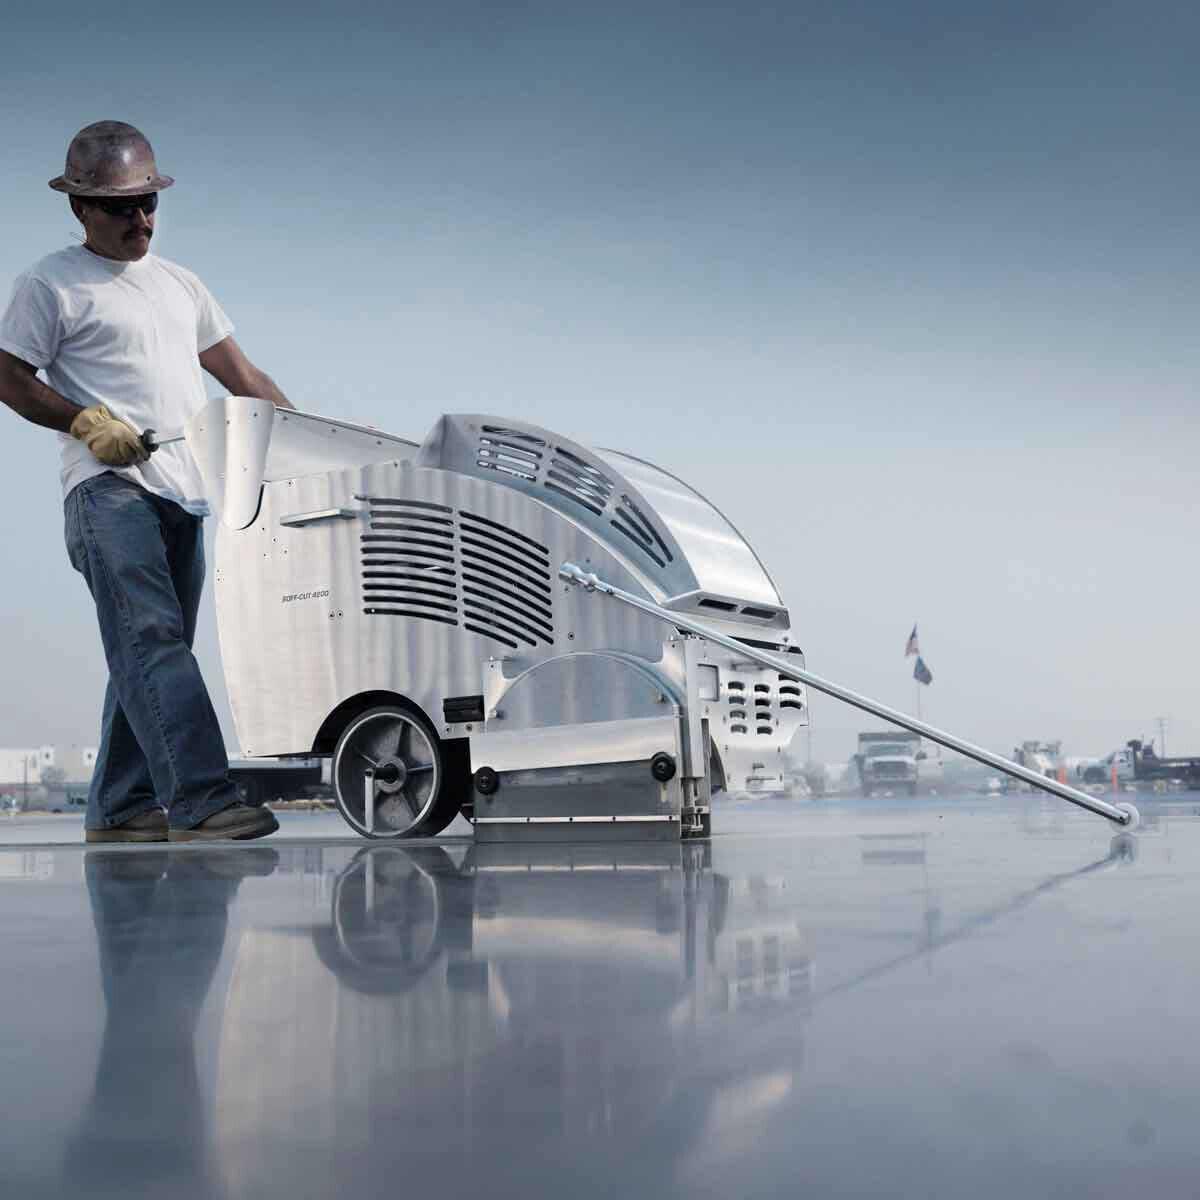 Husqvarna Soff-Cut 4200 Green Concrete Road Cutting Saw